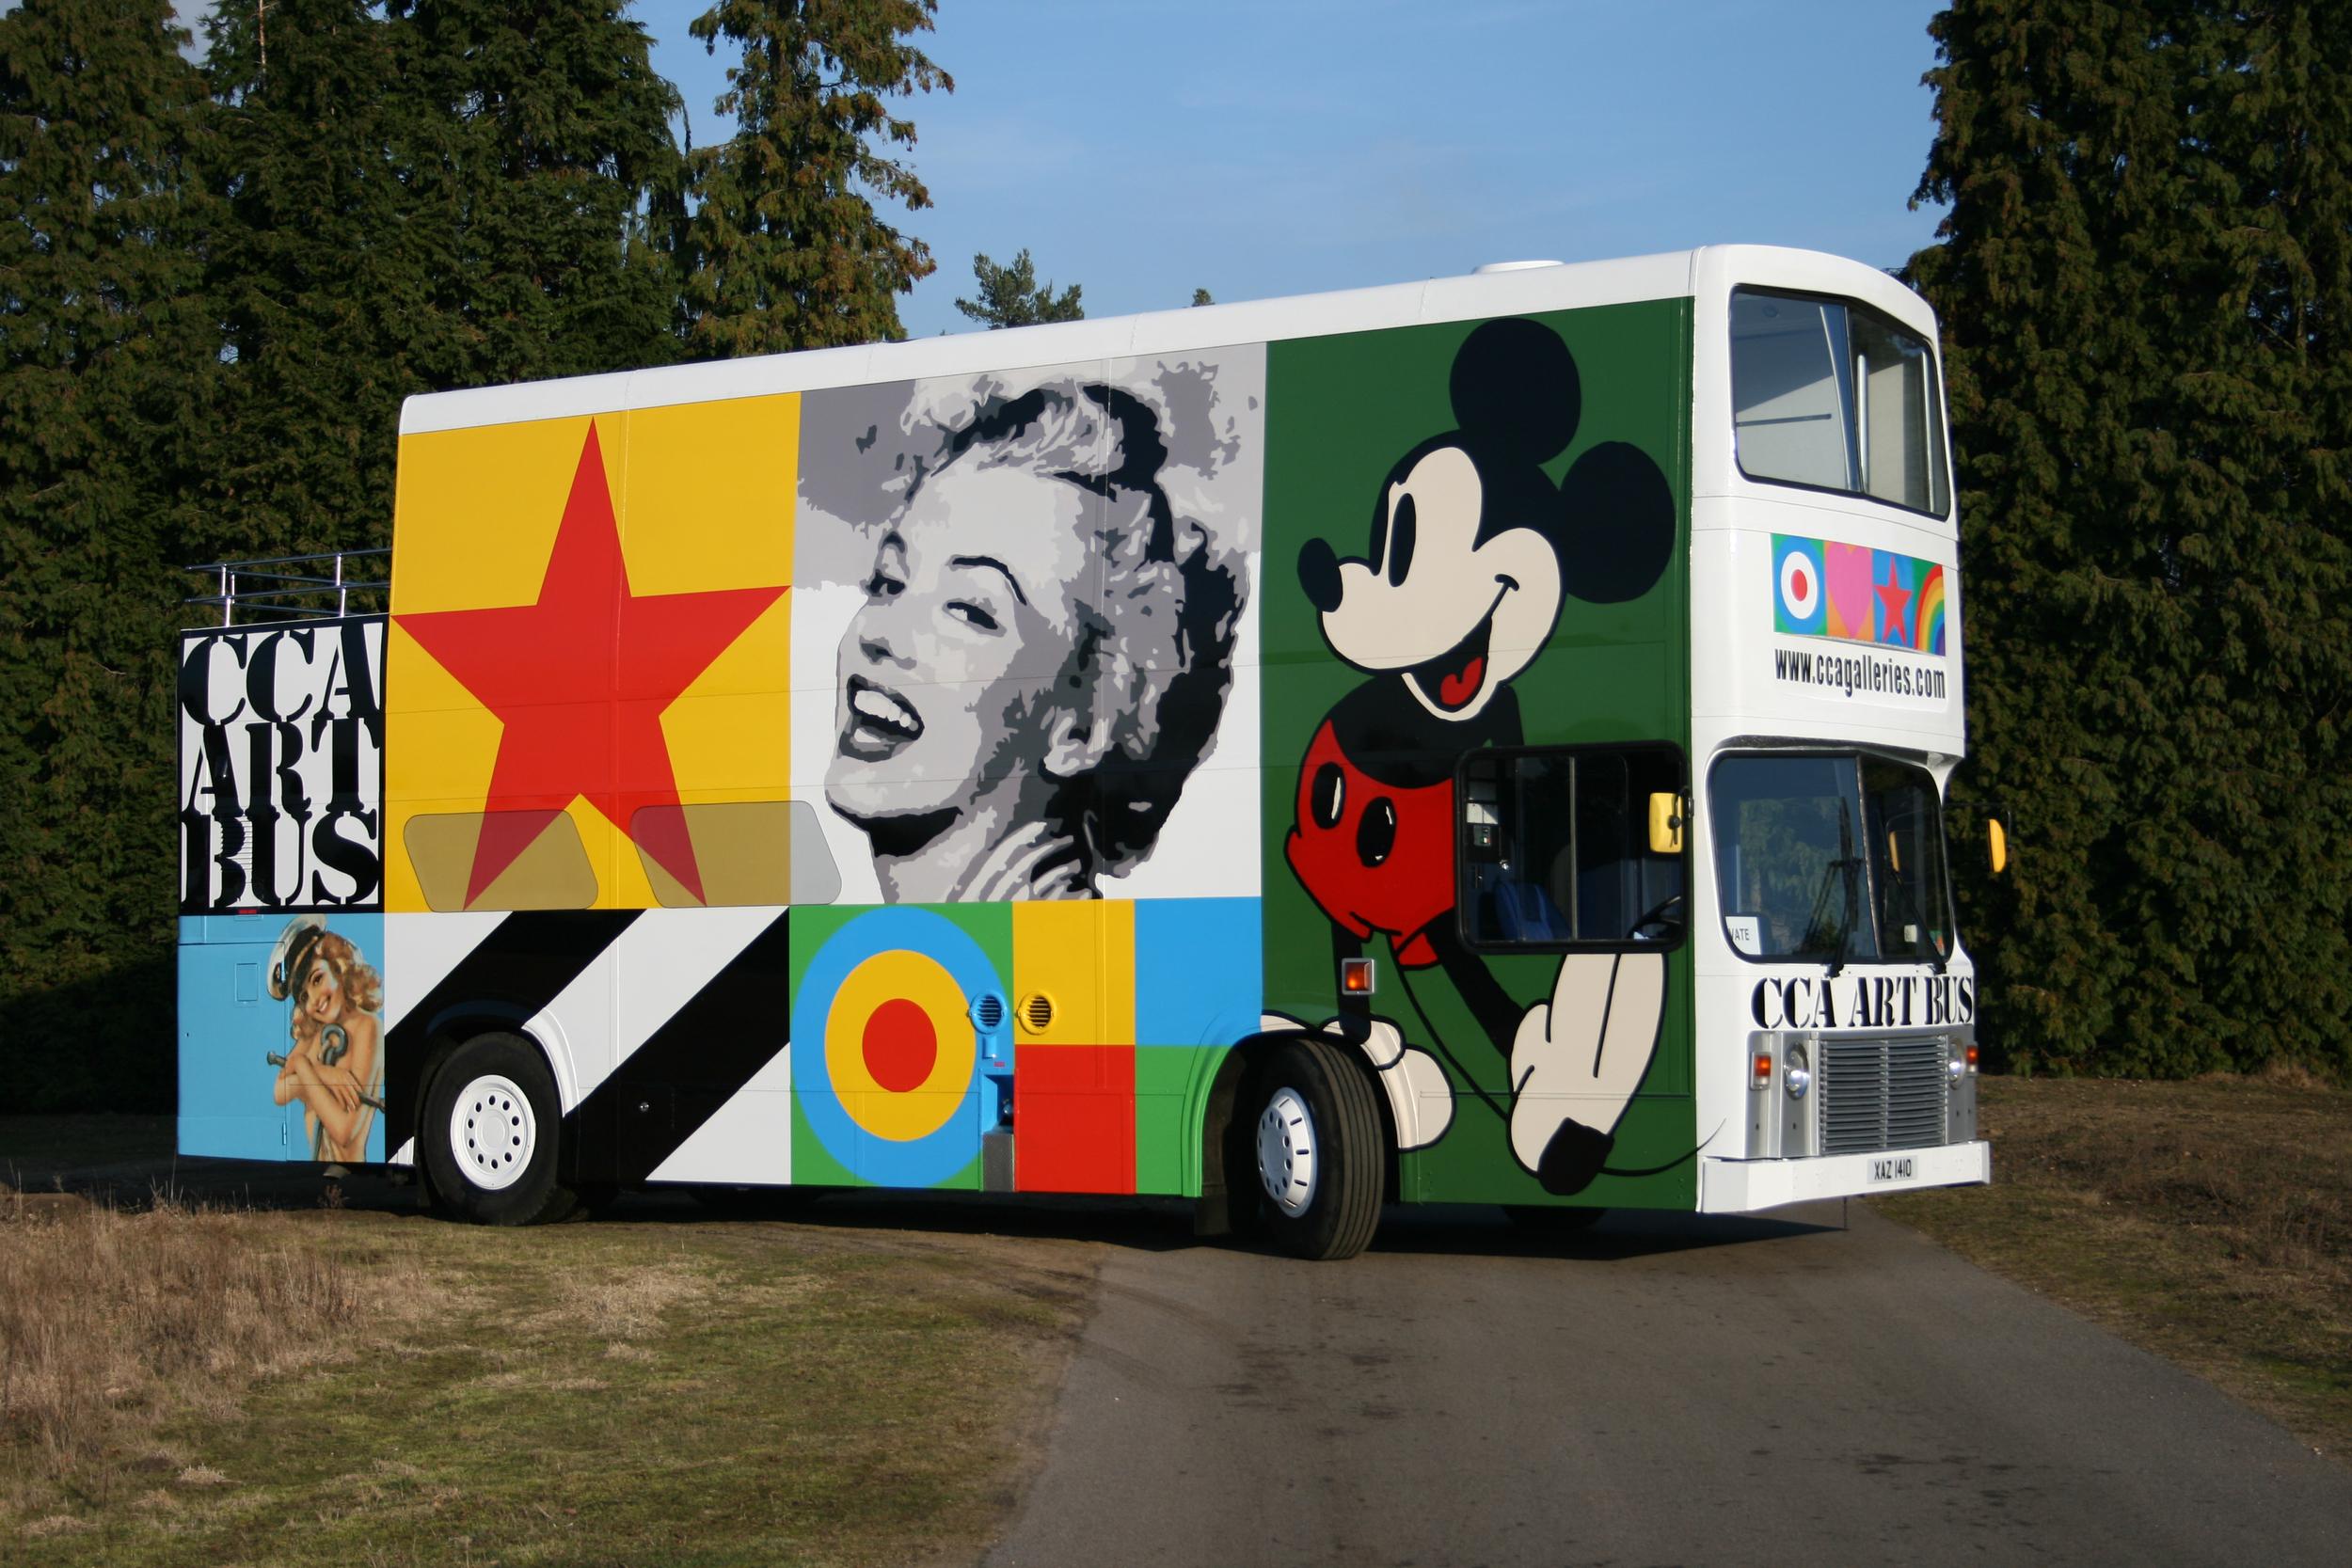 The CCA Art Bus designed by Sir Peter Blake